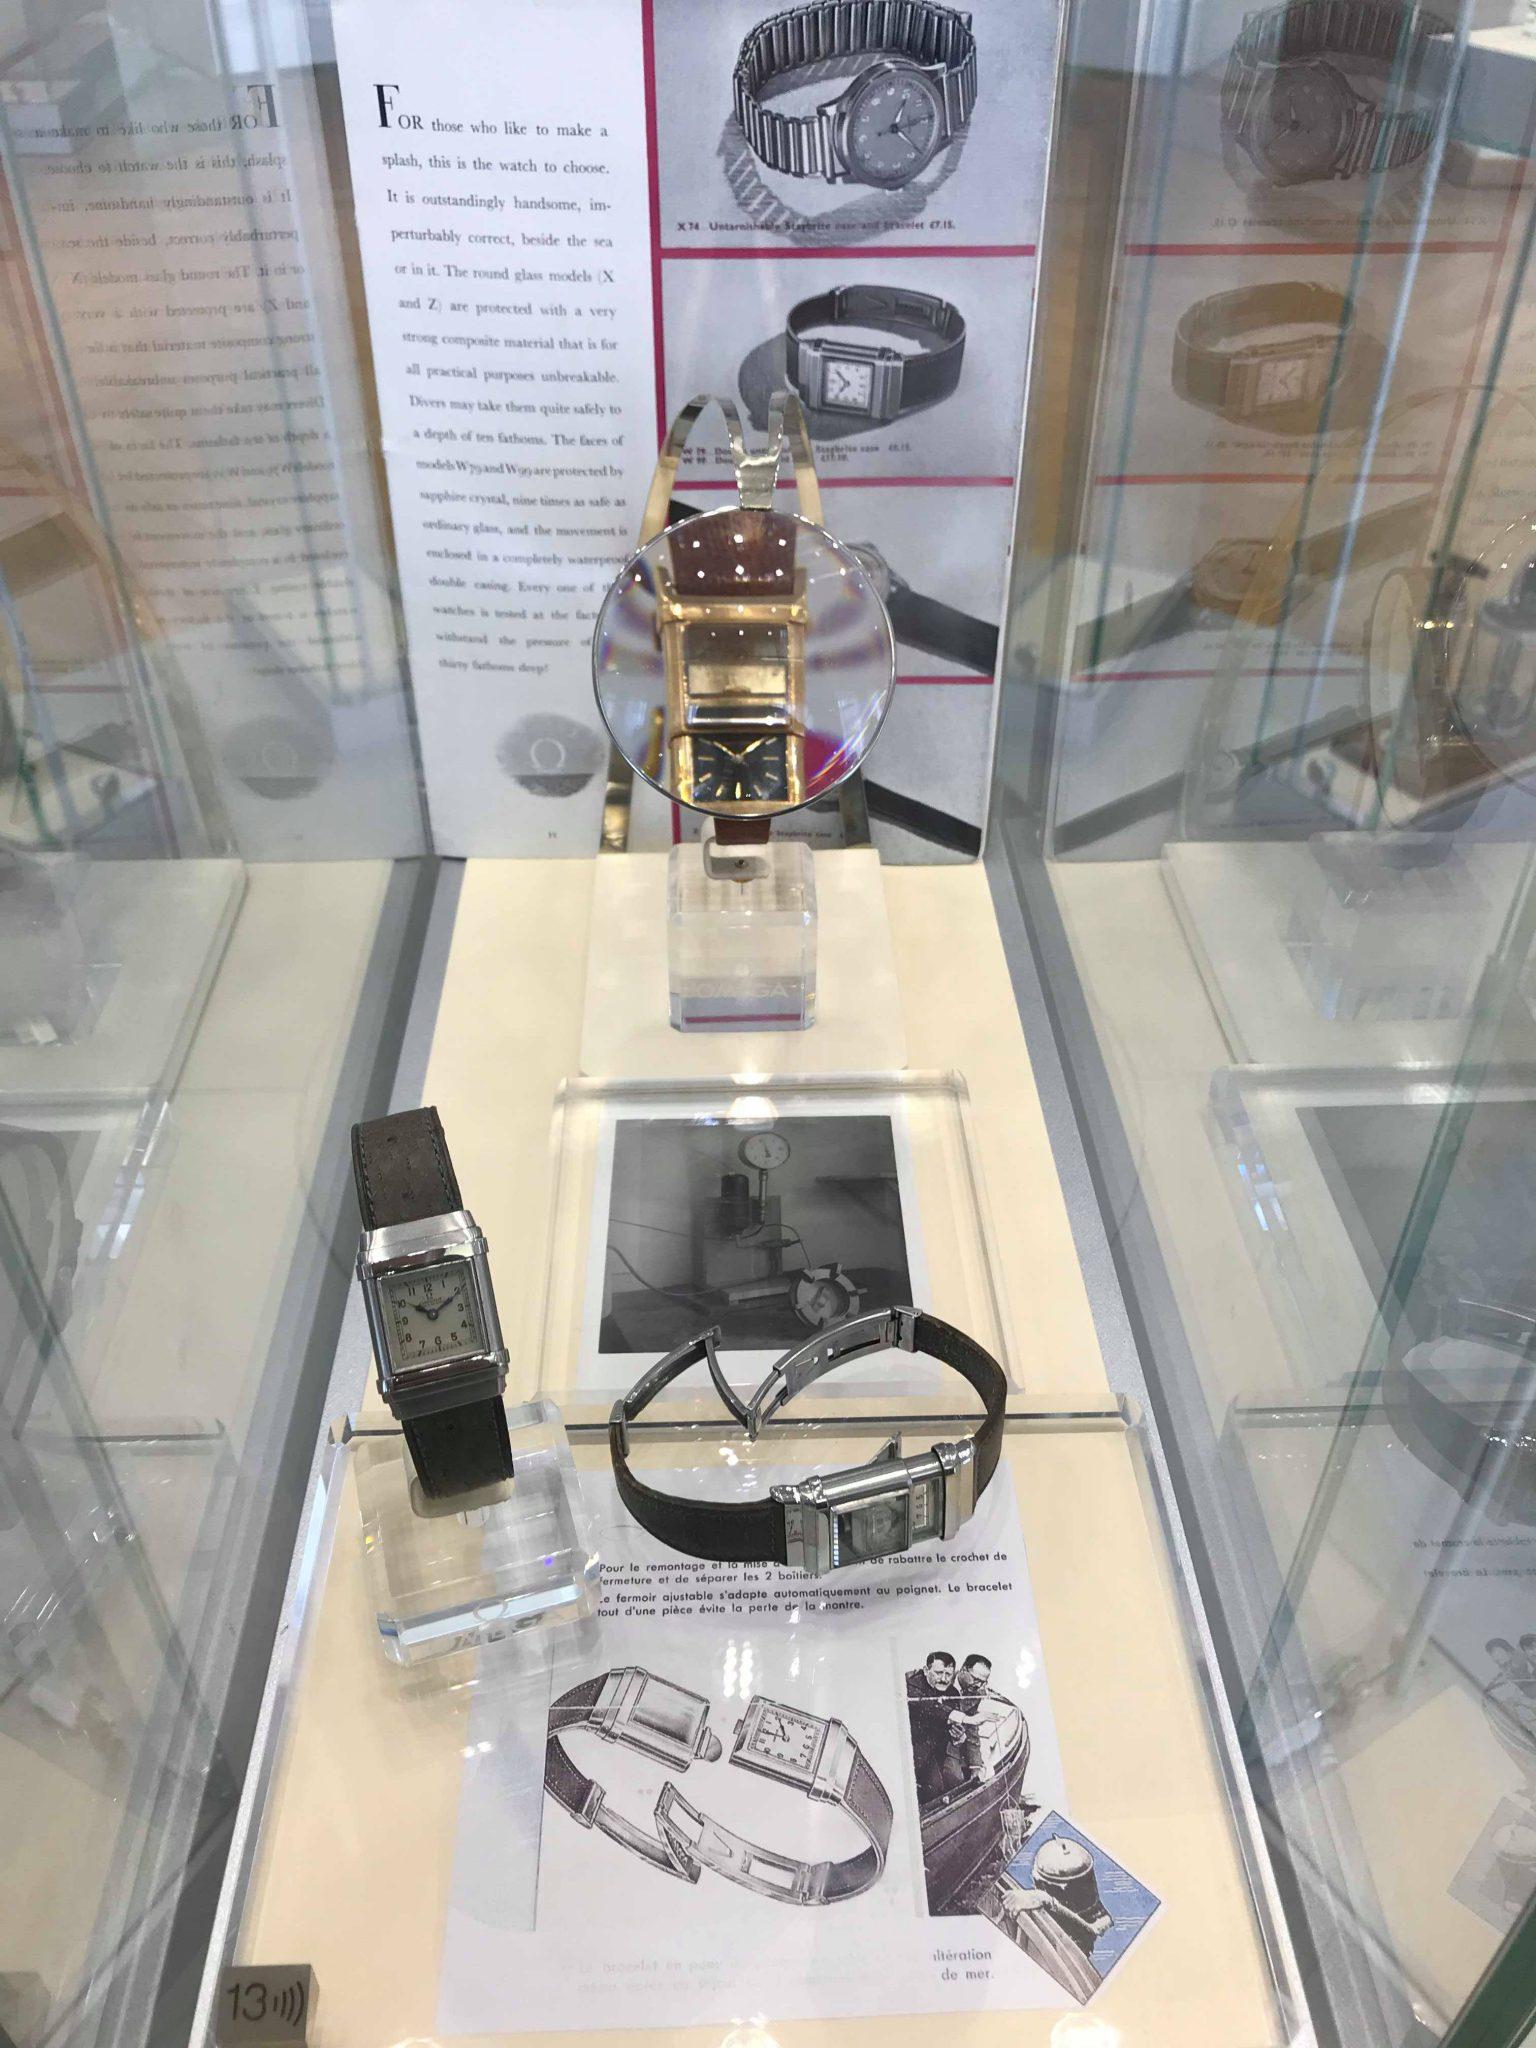 Seamaster Omega watch, Omega Museum, Biel, Switzerland